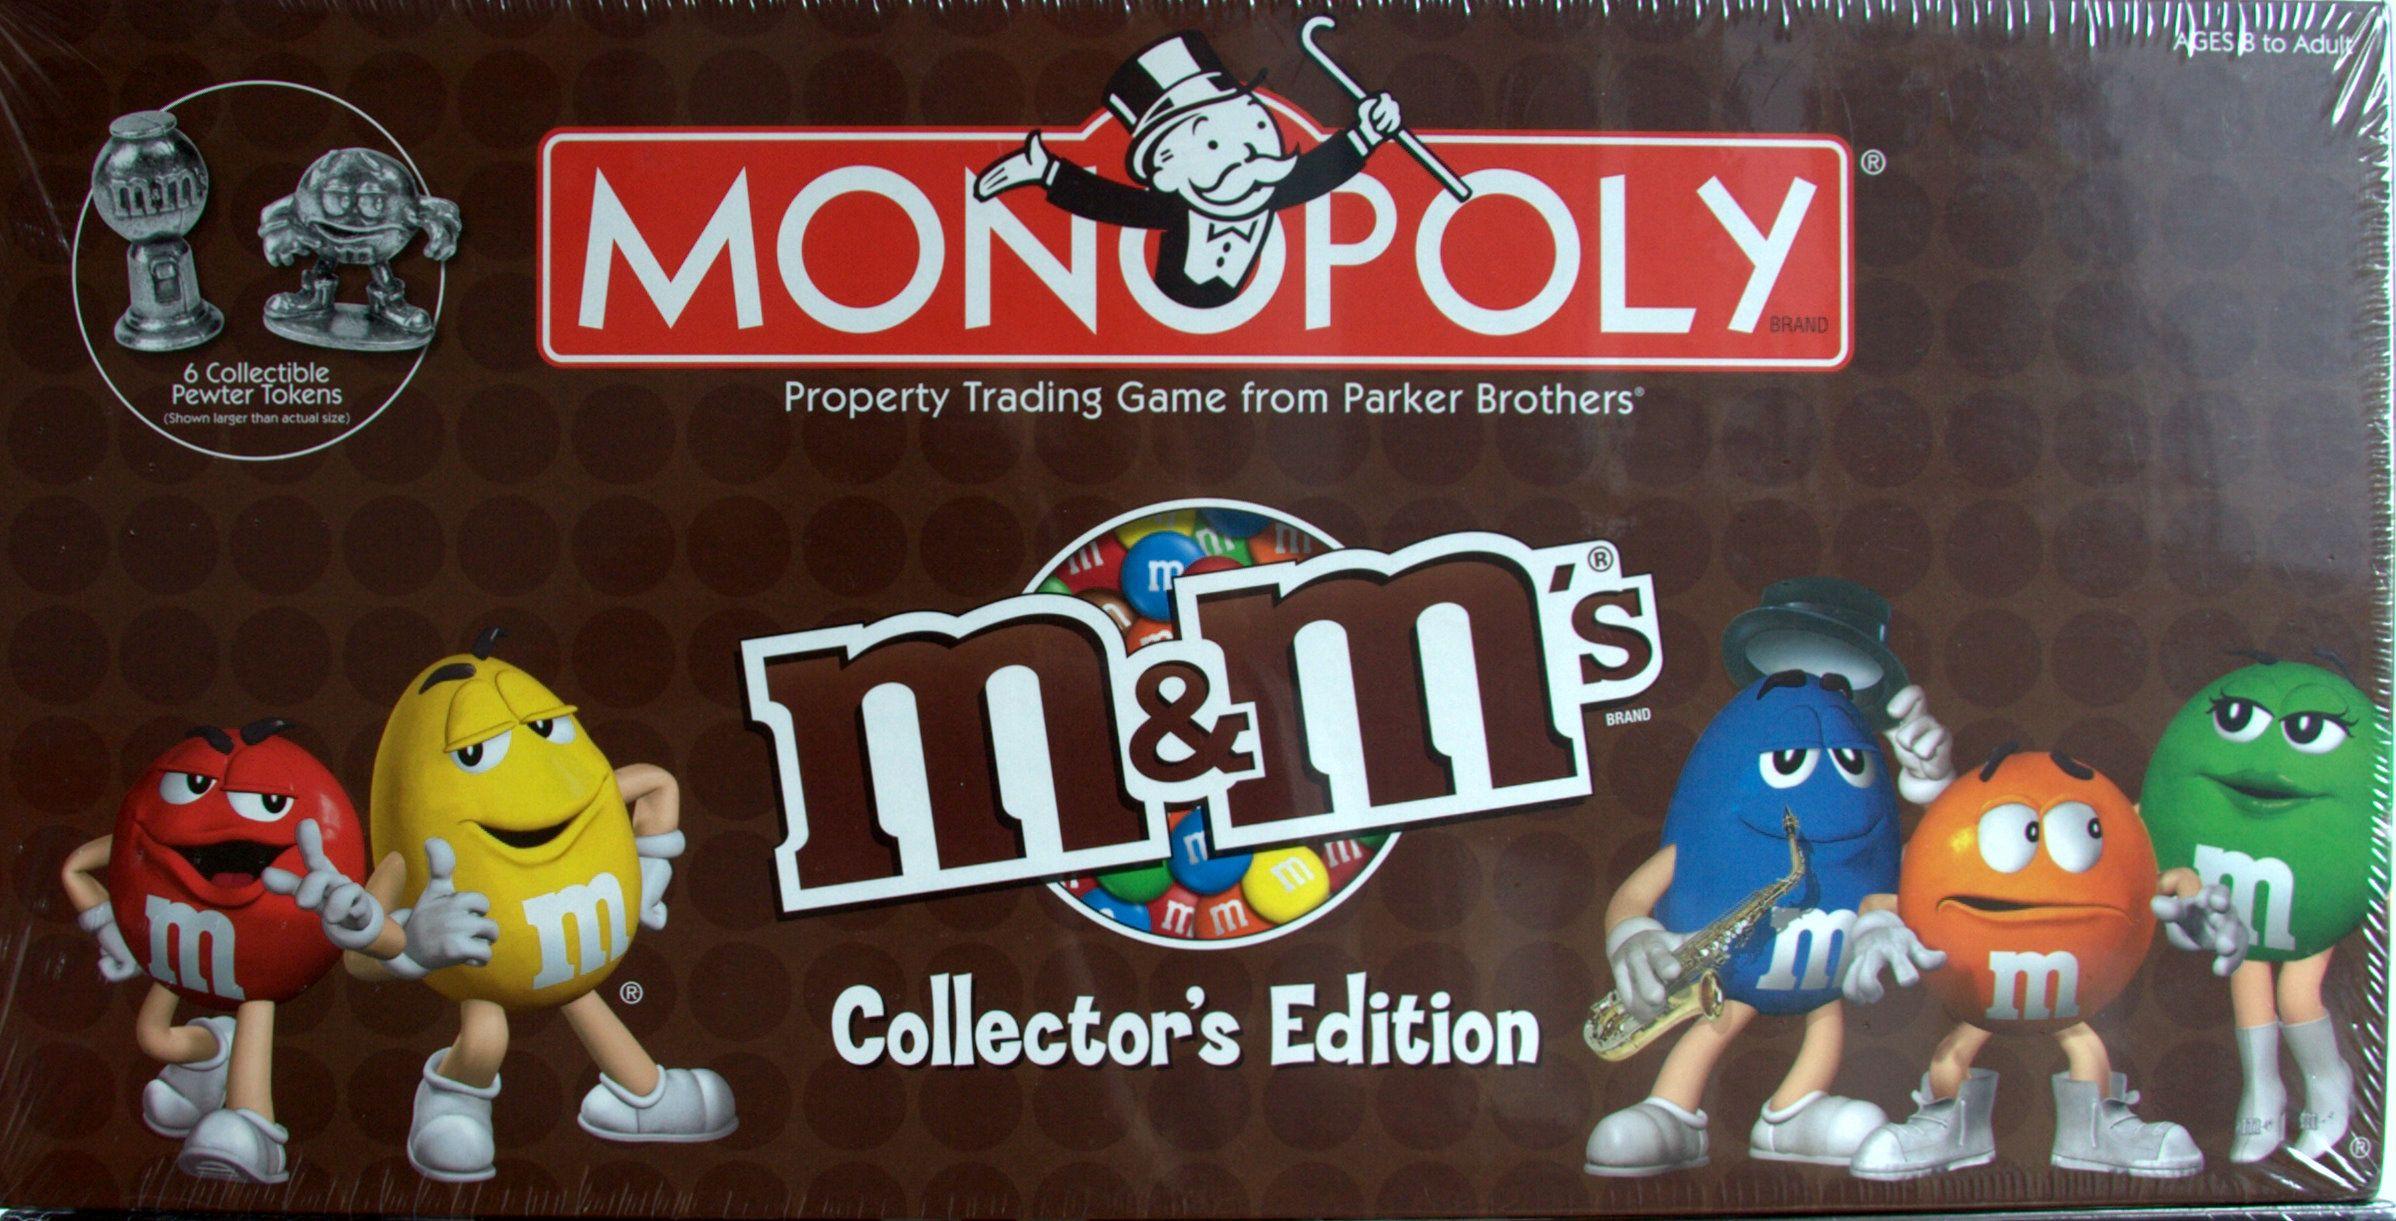 Pin by Jordan Boward on Monopoly Game Favorite board